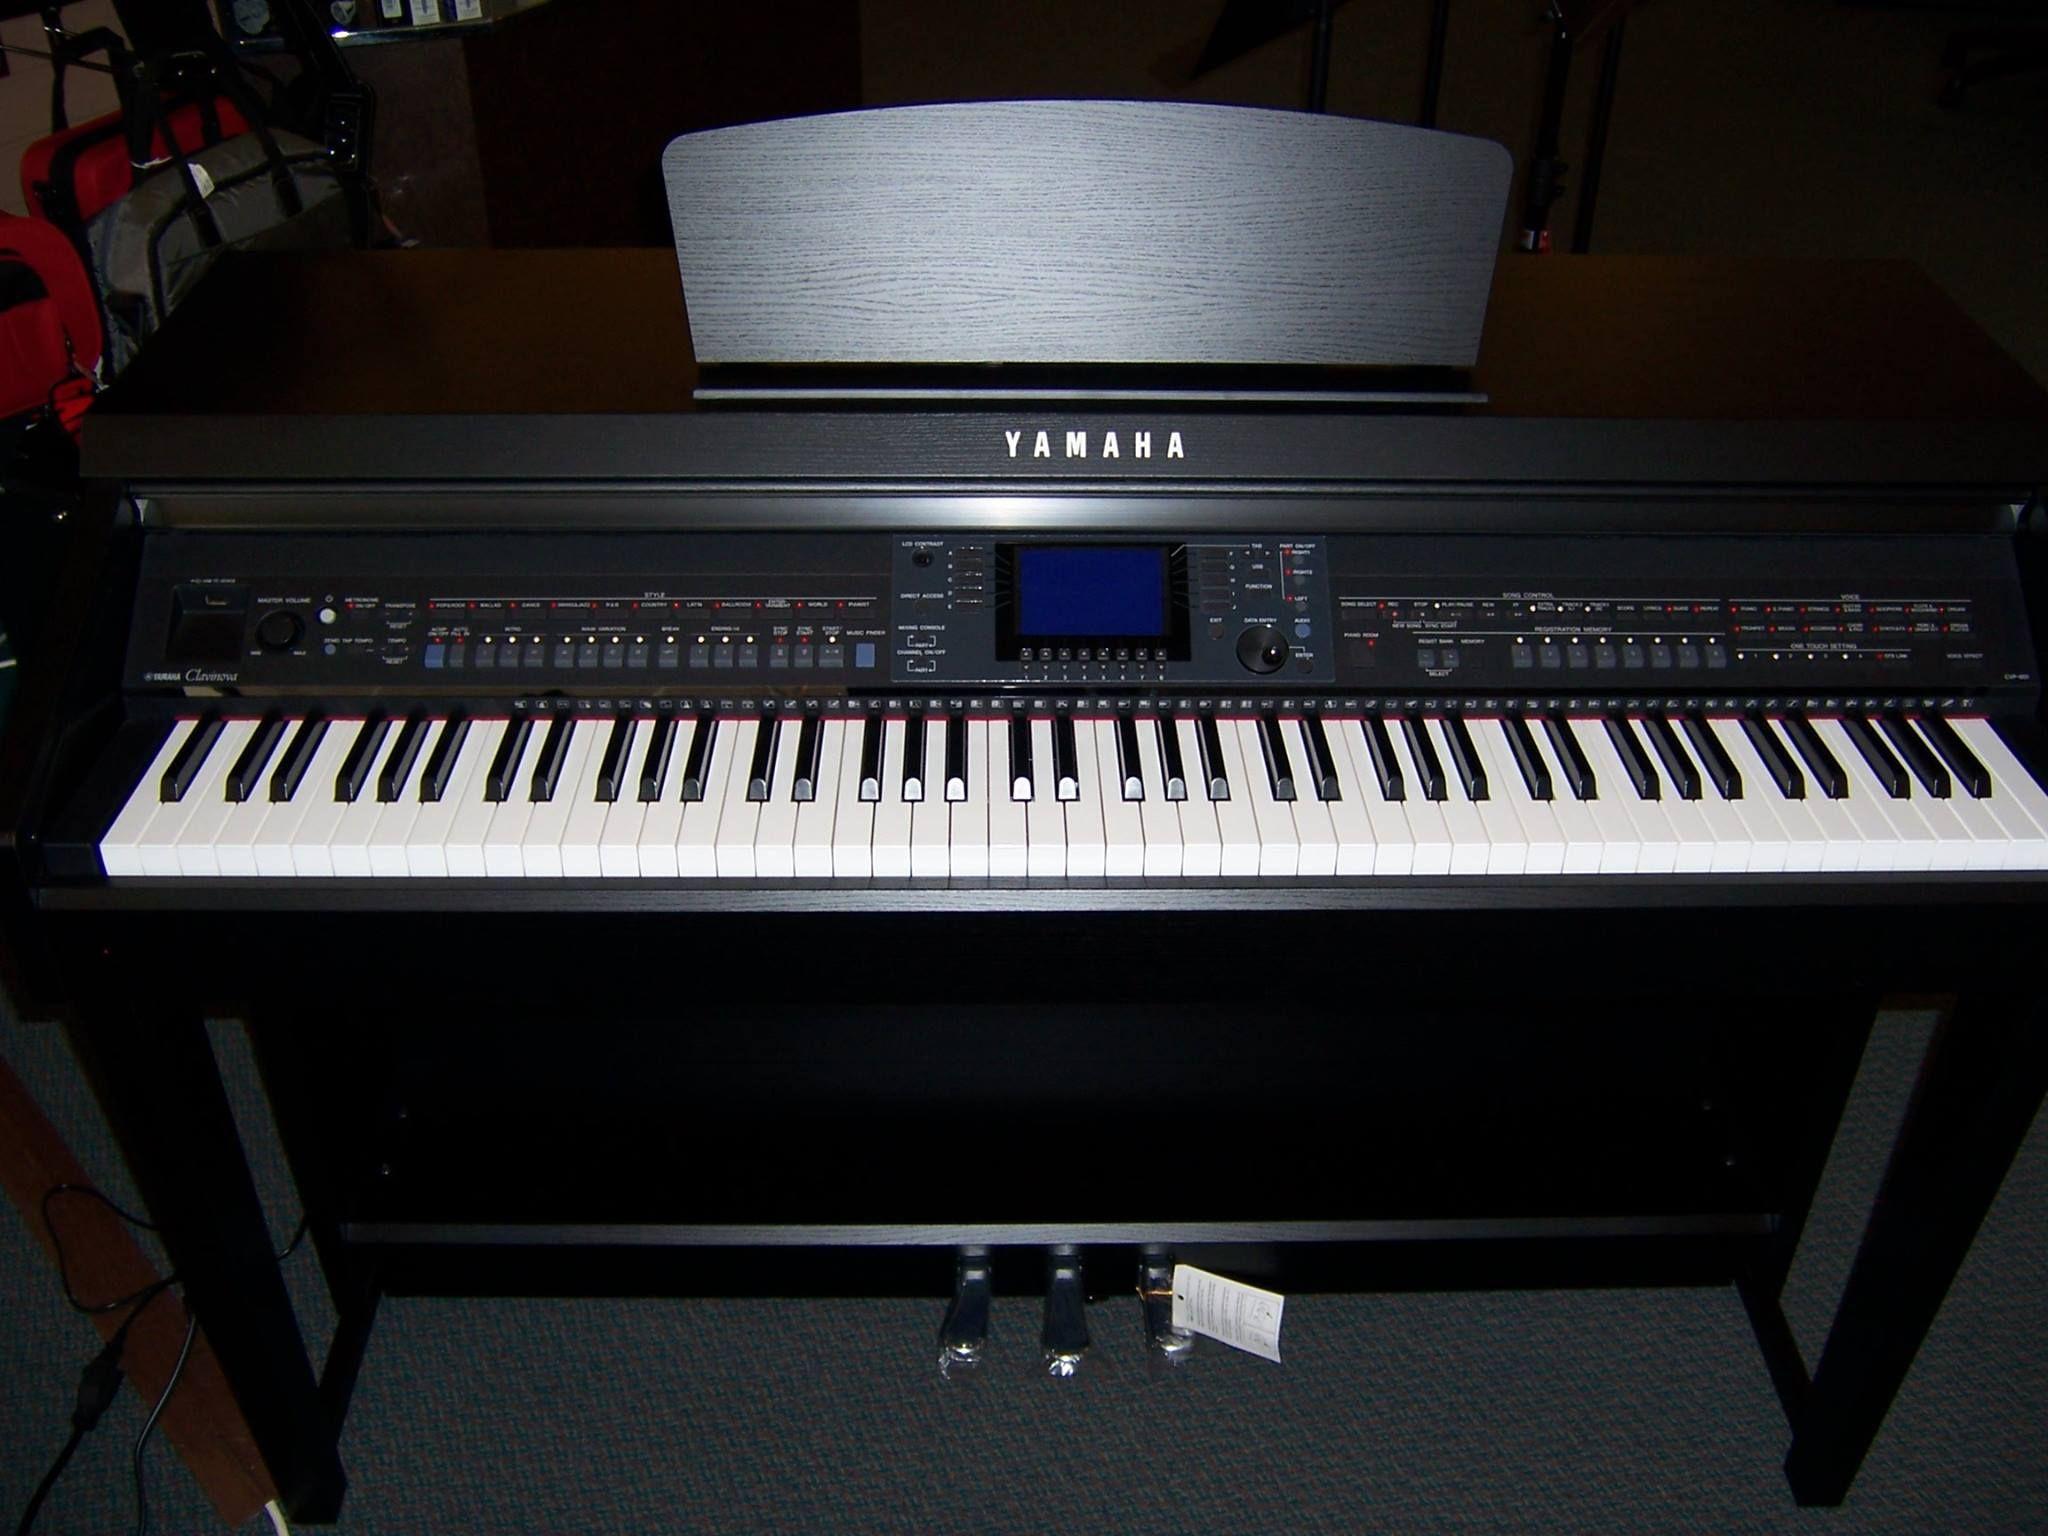 Yamaha clavinova cvp 601 at kincaid 39 s music 88 graded for Yamaha clavinova cvp 601